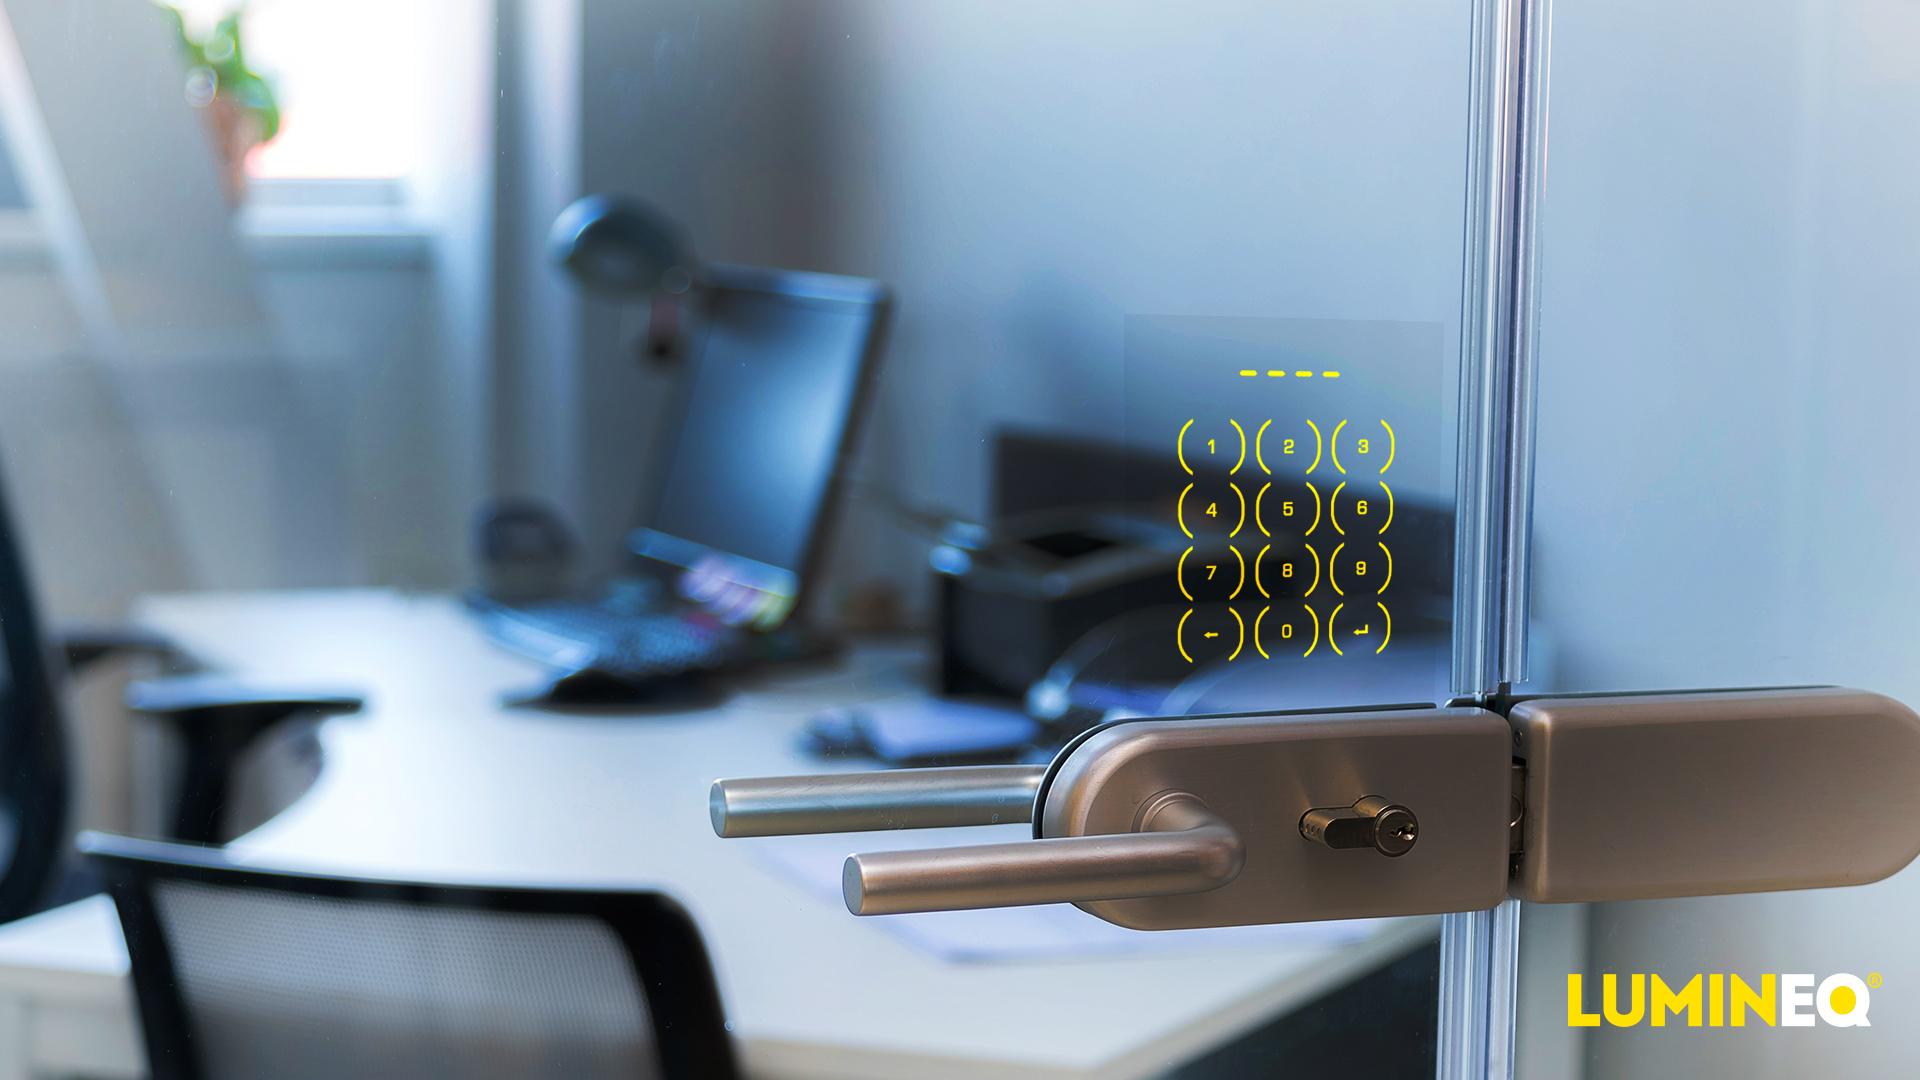 Office_keypad-2021-1920x1080-v02